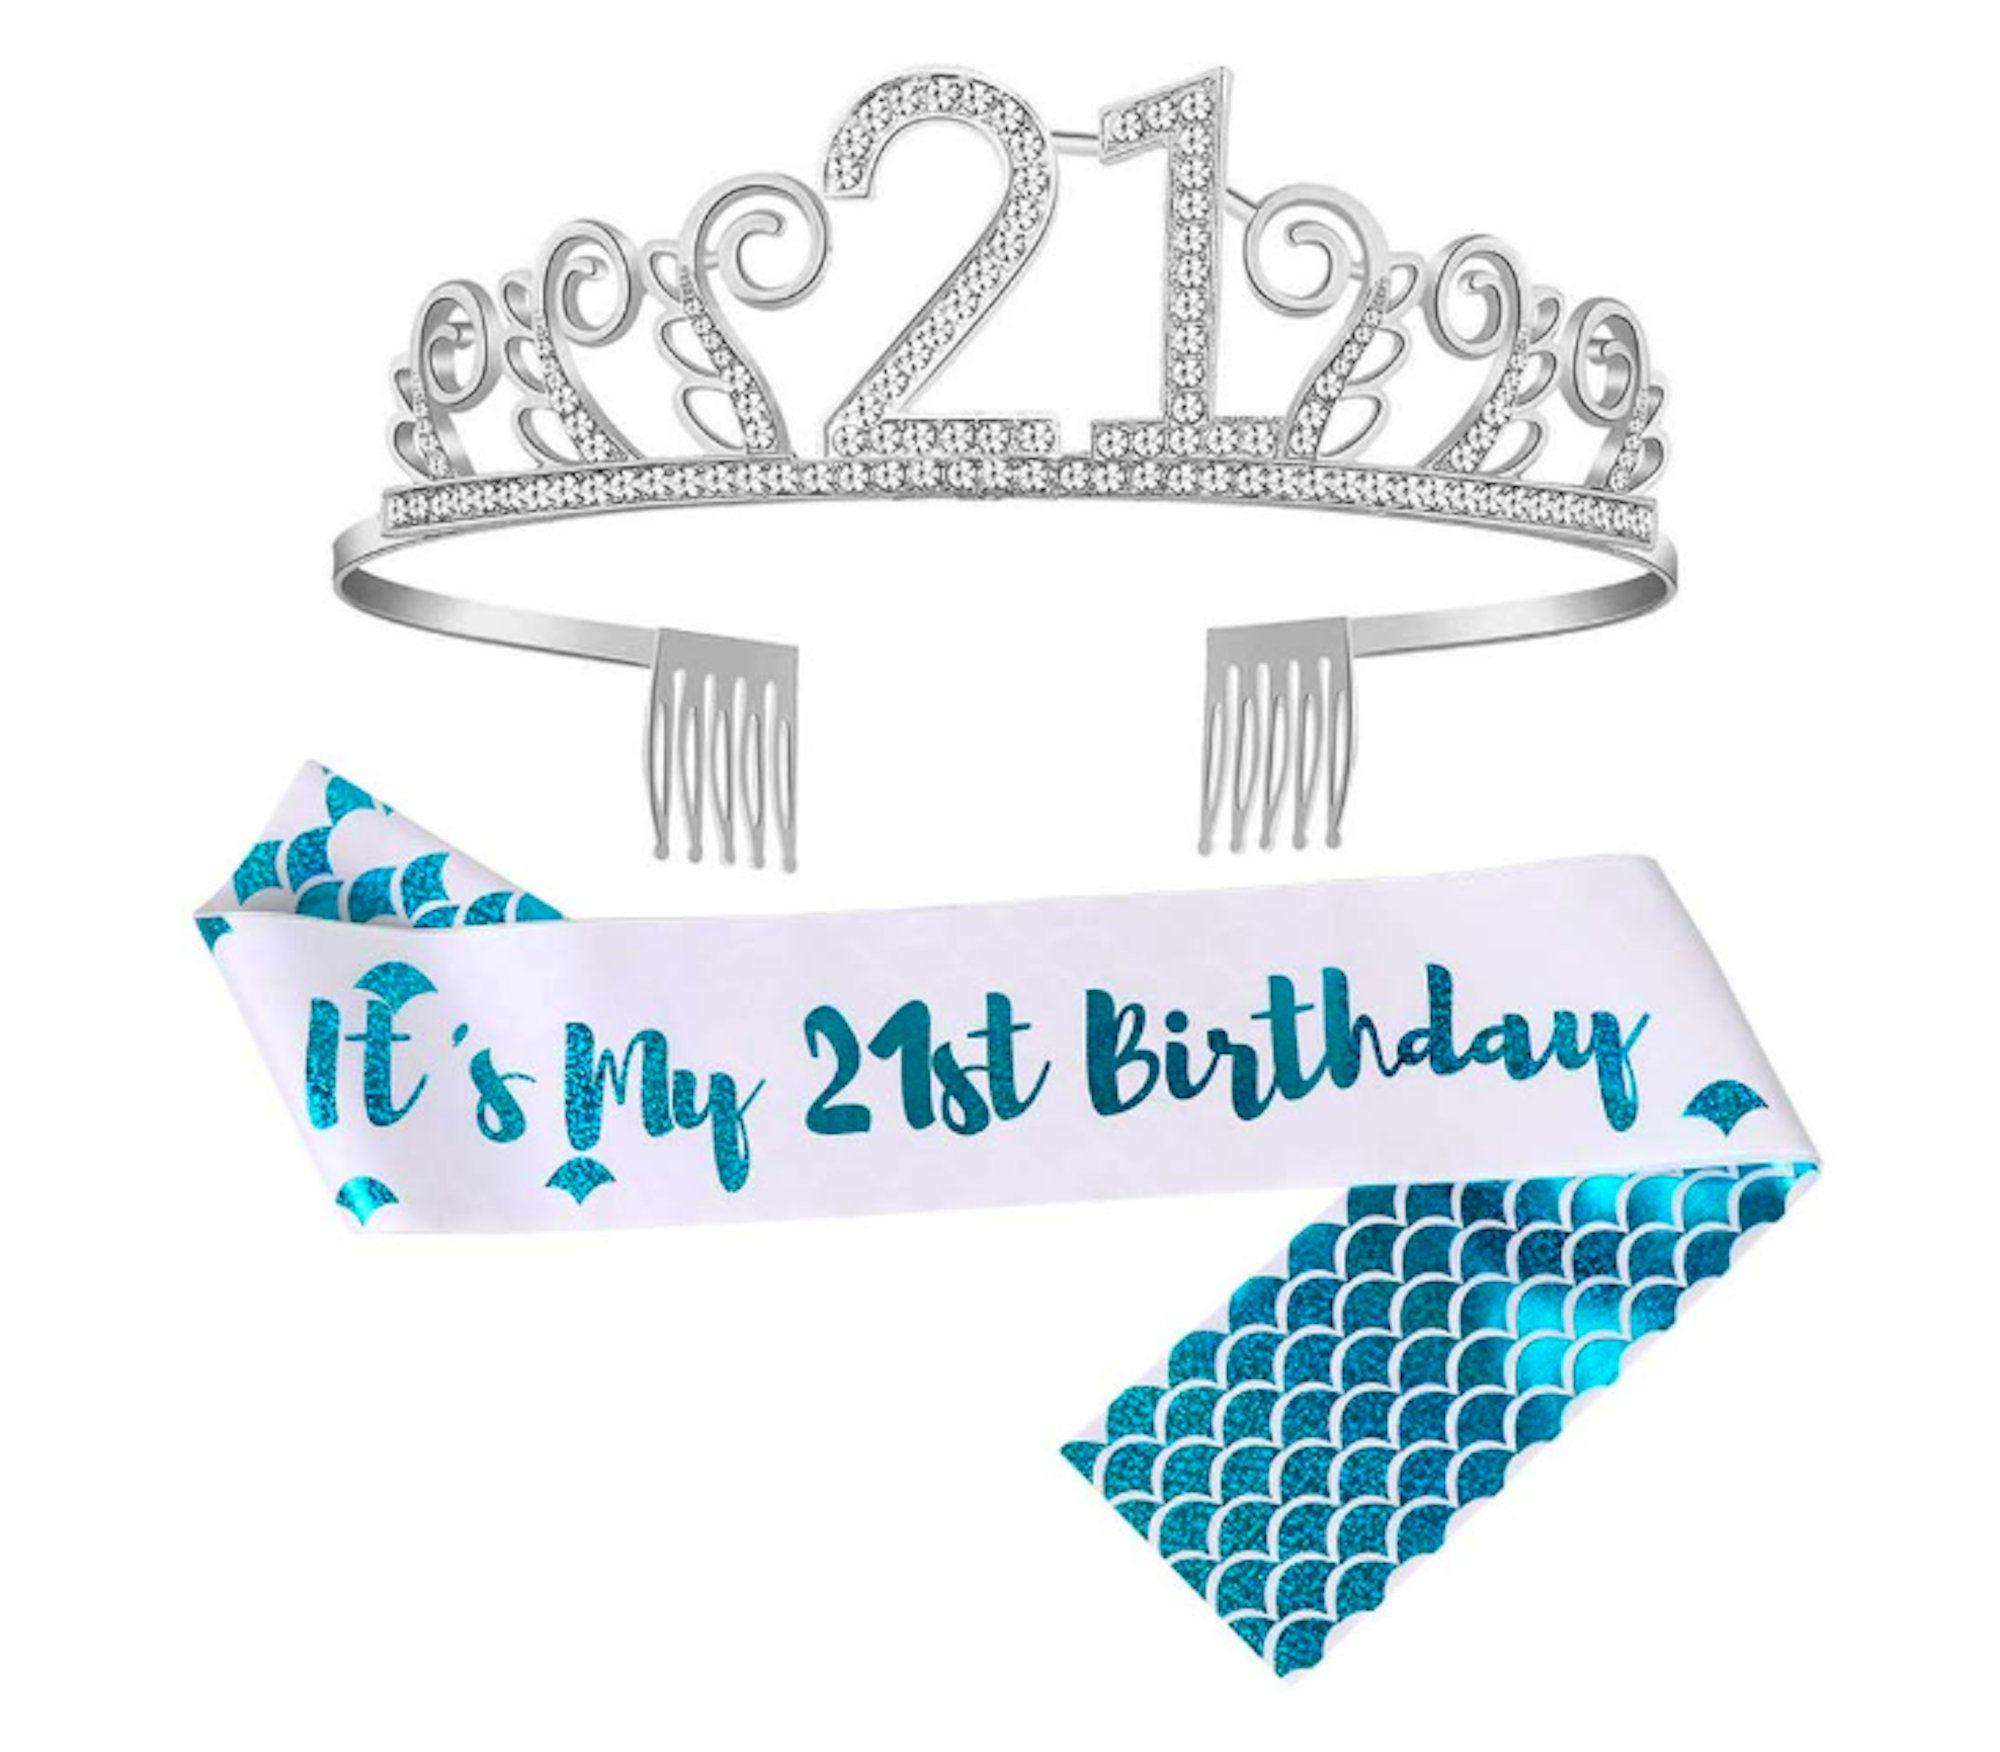 Birthday Sash and Tiara BlueBirthday Sash and CrownHappy Birthday Party Su